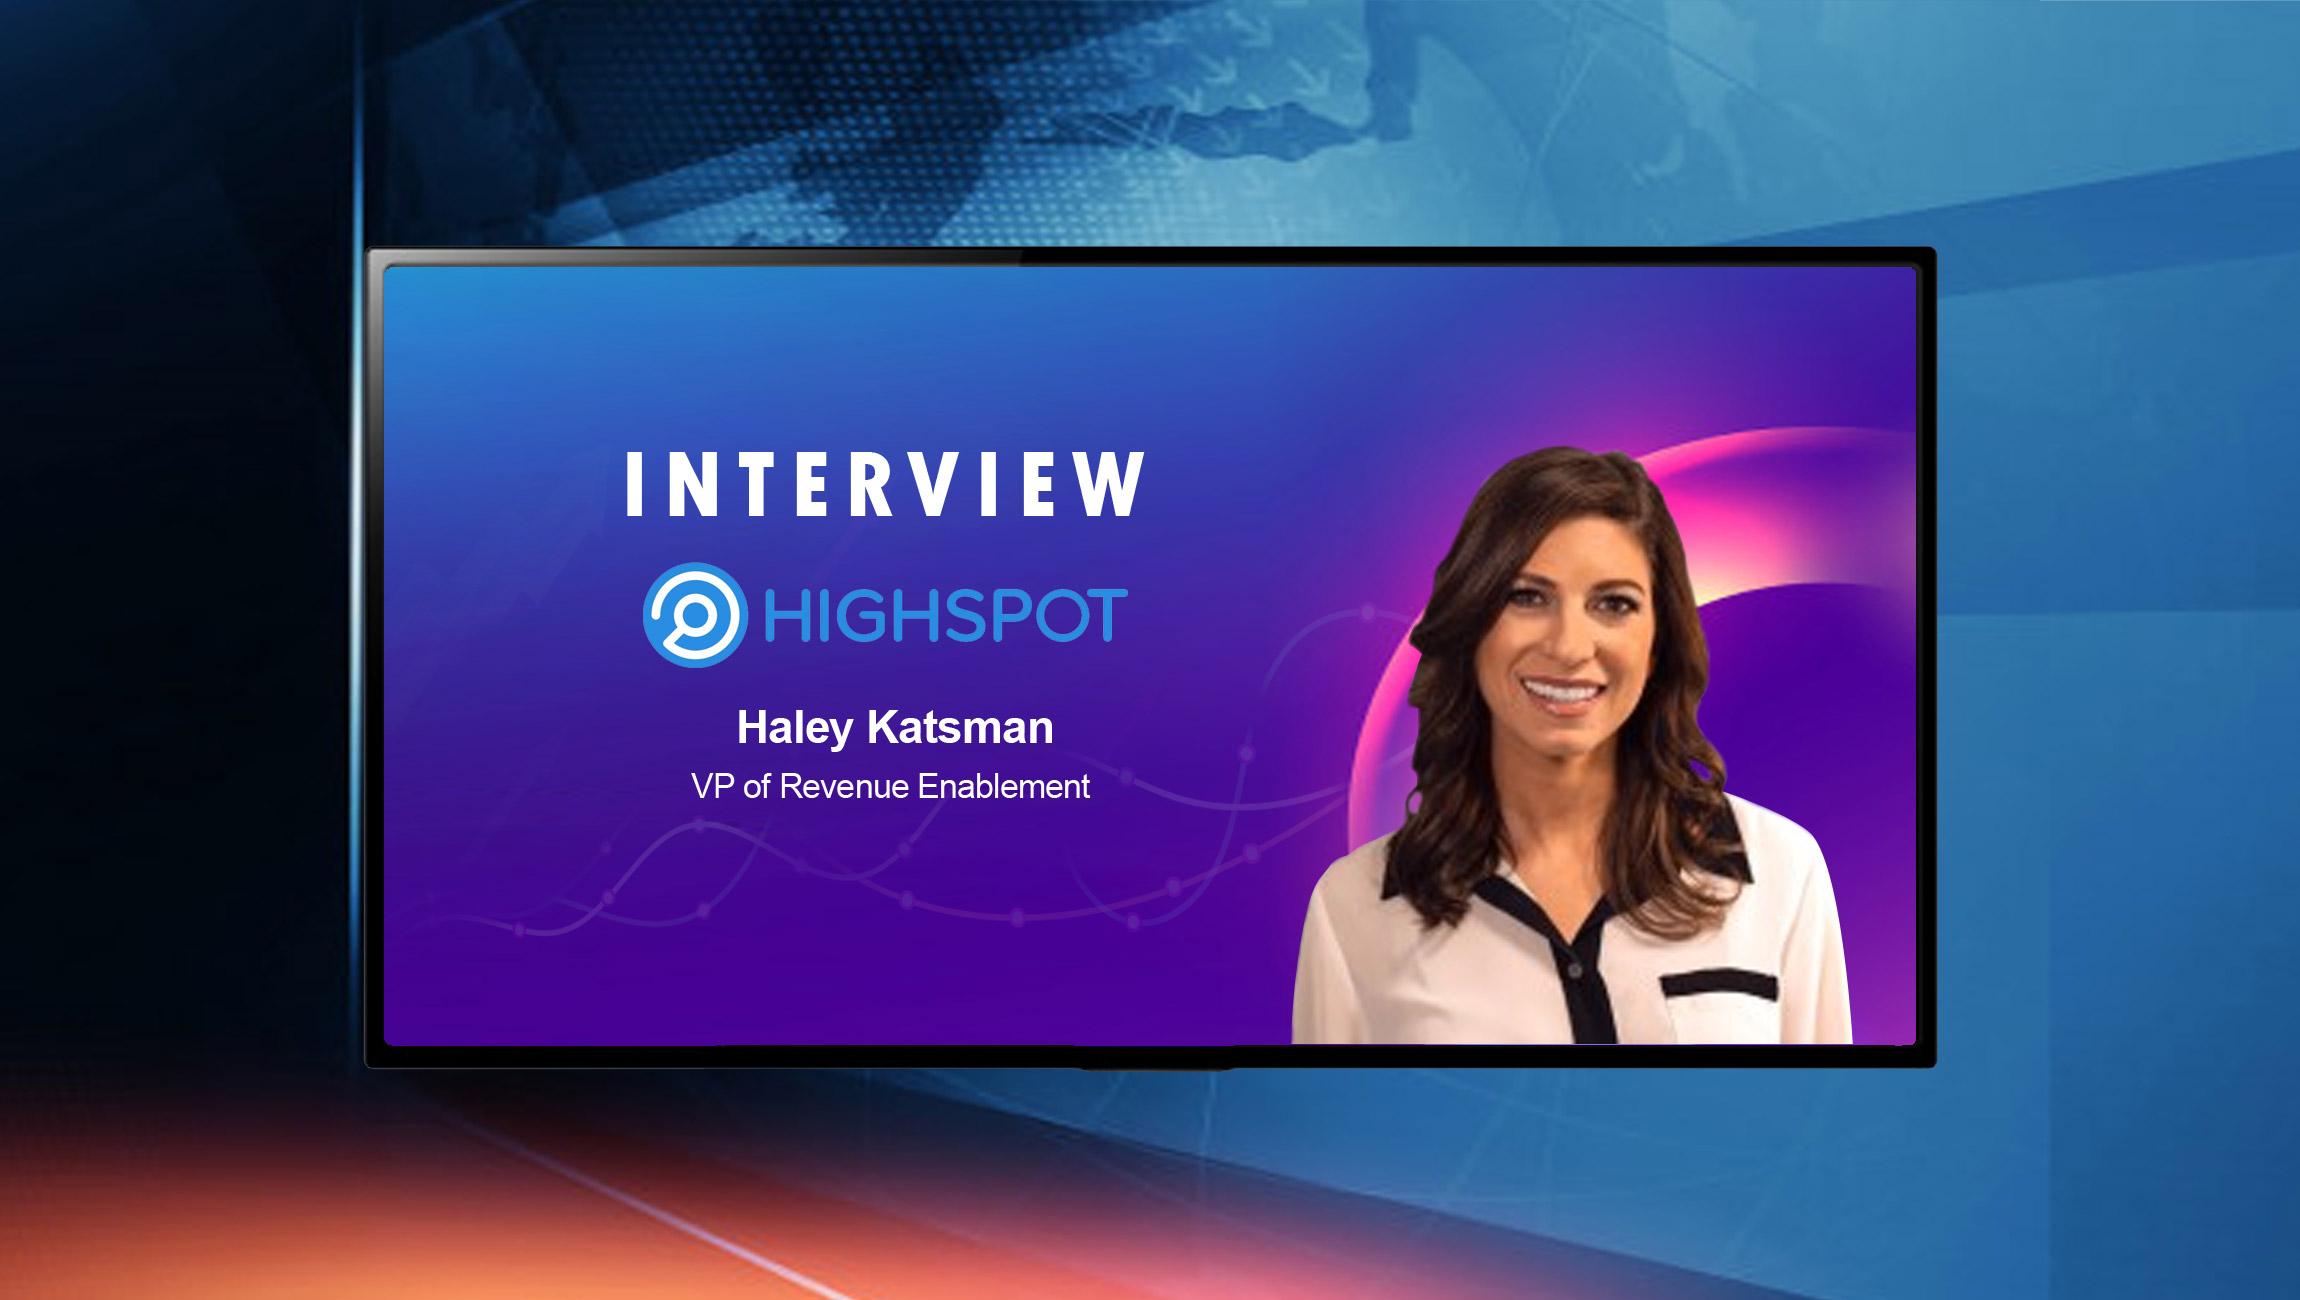 SalesTechStar Interview with Haley Katsman, VP of Revenue Enablement at Highspot